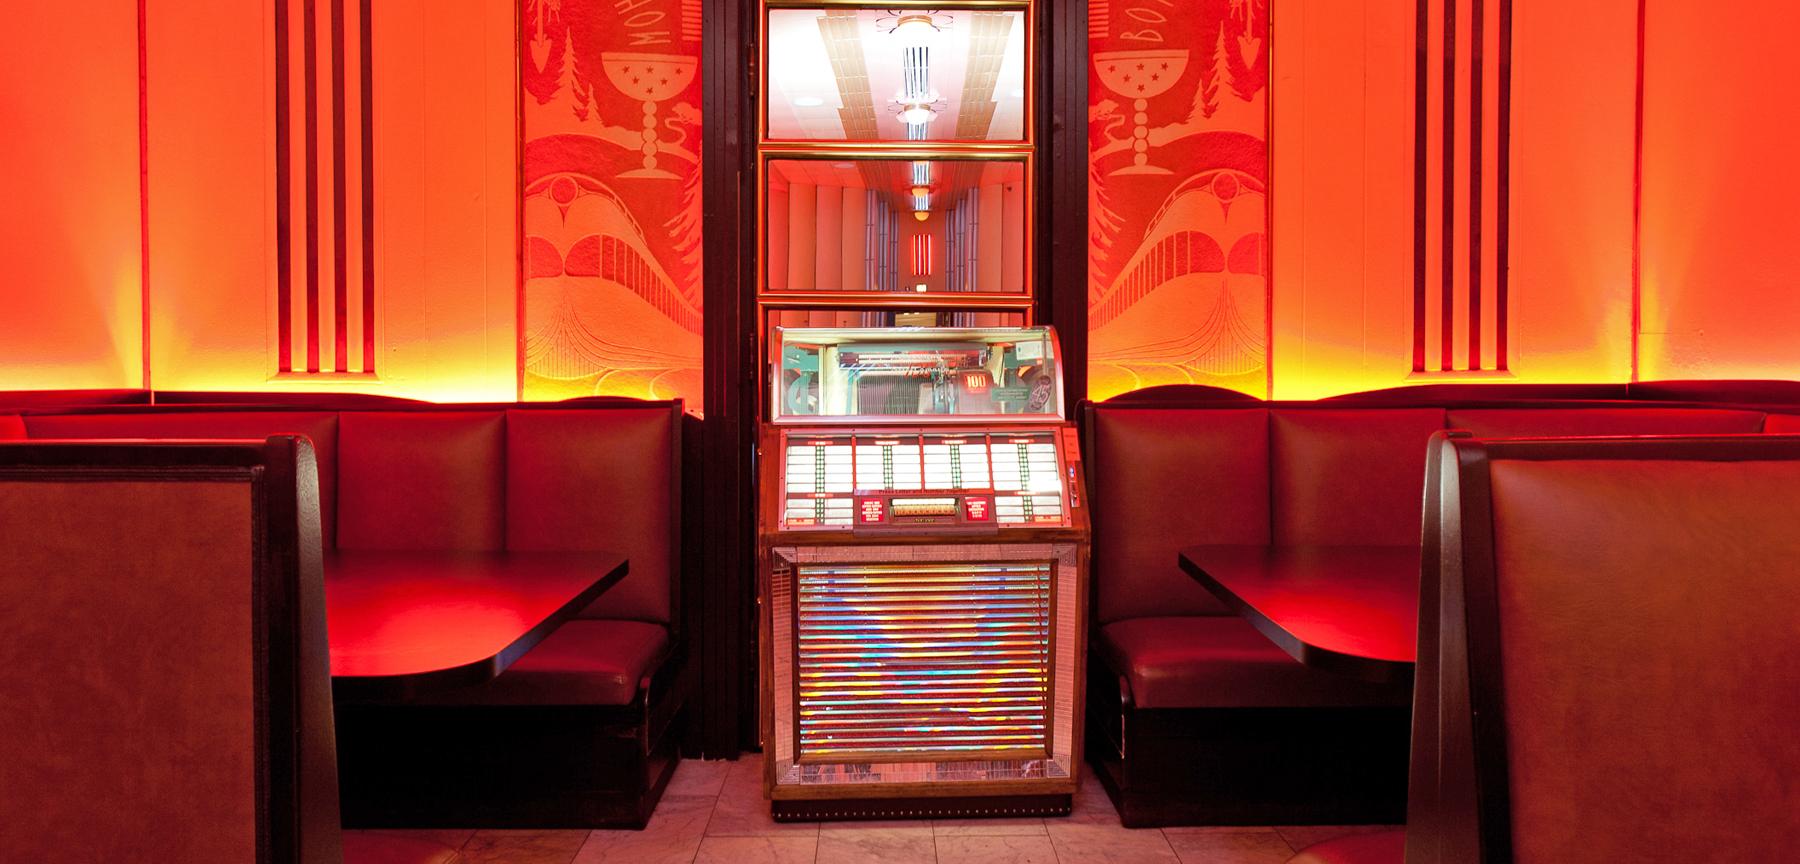 The Cruise Room jukebox